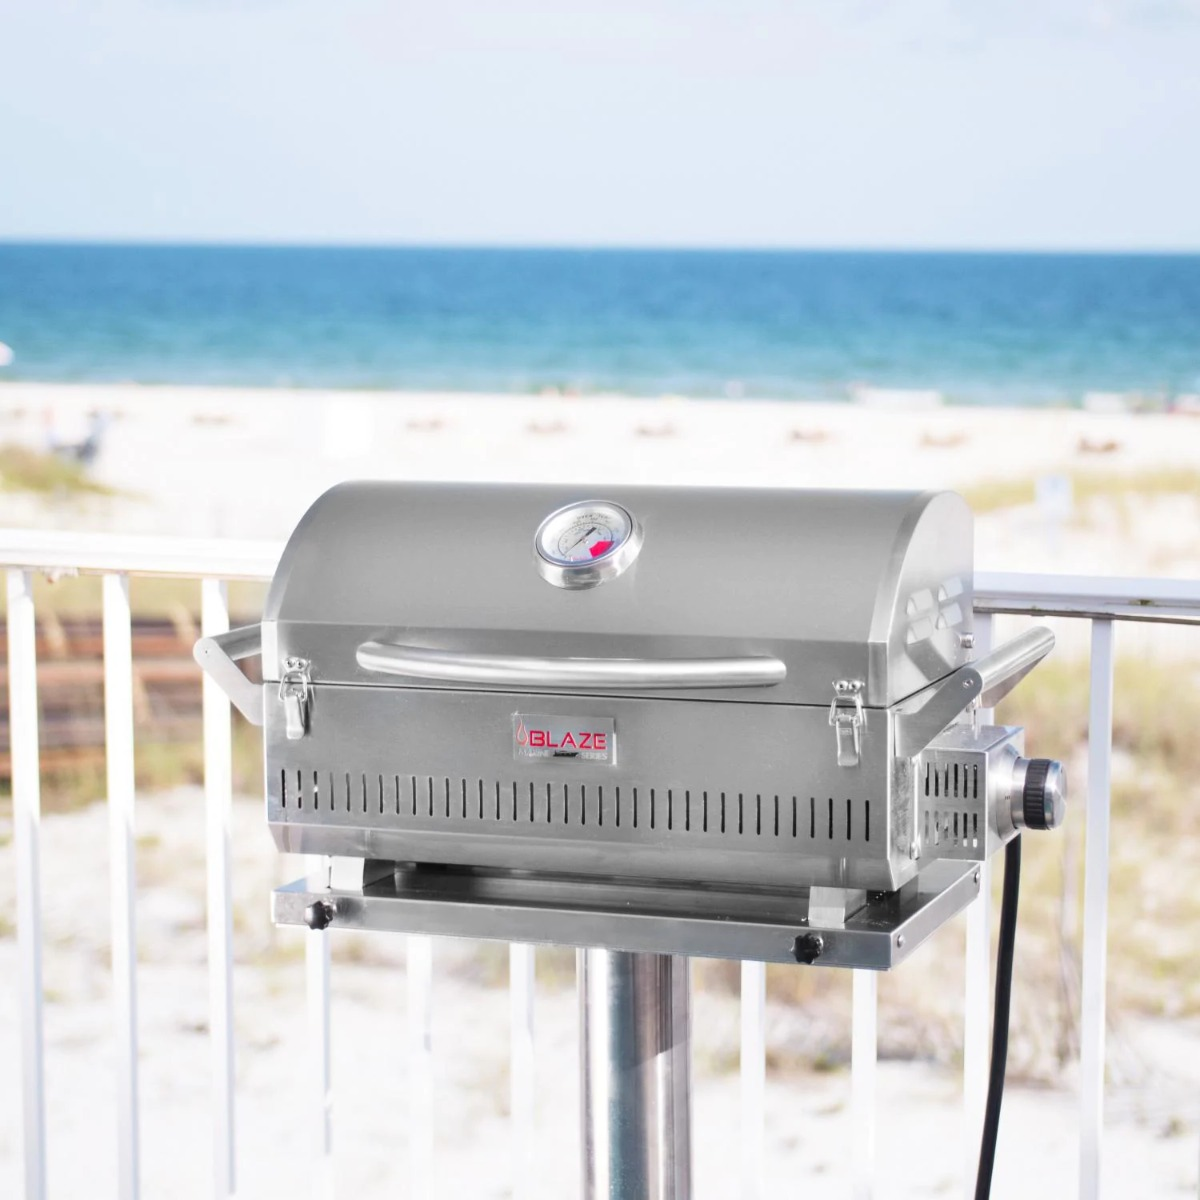 Blaze Professional LUX Marine Grade Portable Propane Gas Grill On Pedestal With Side Shelves - blz-1pro-prtmg-lp+blz-prtped-mg10+blz-prtped-mgss